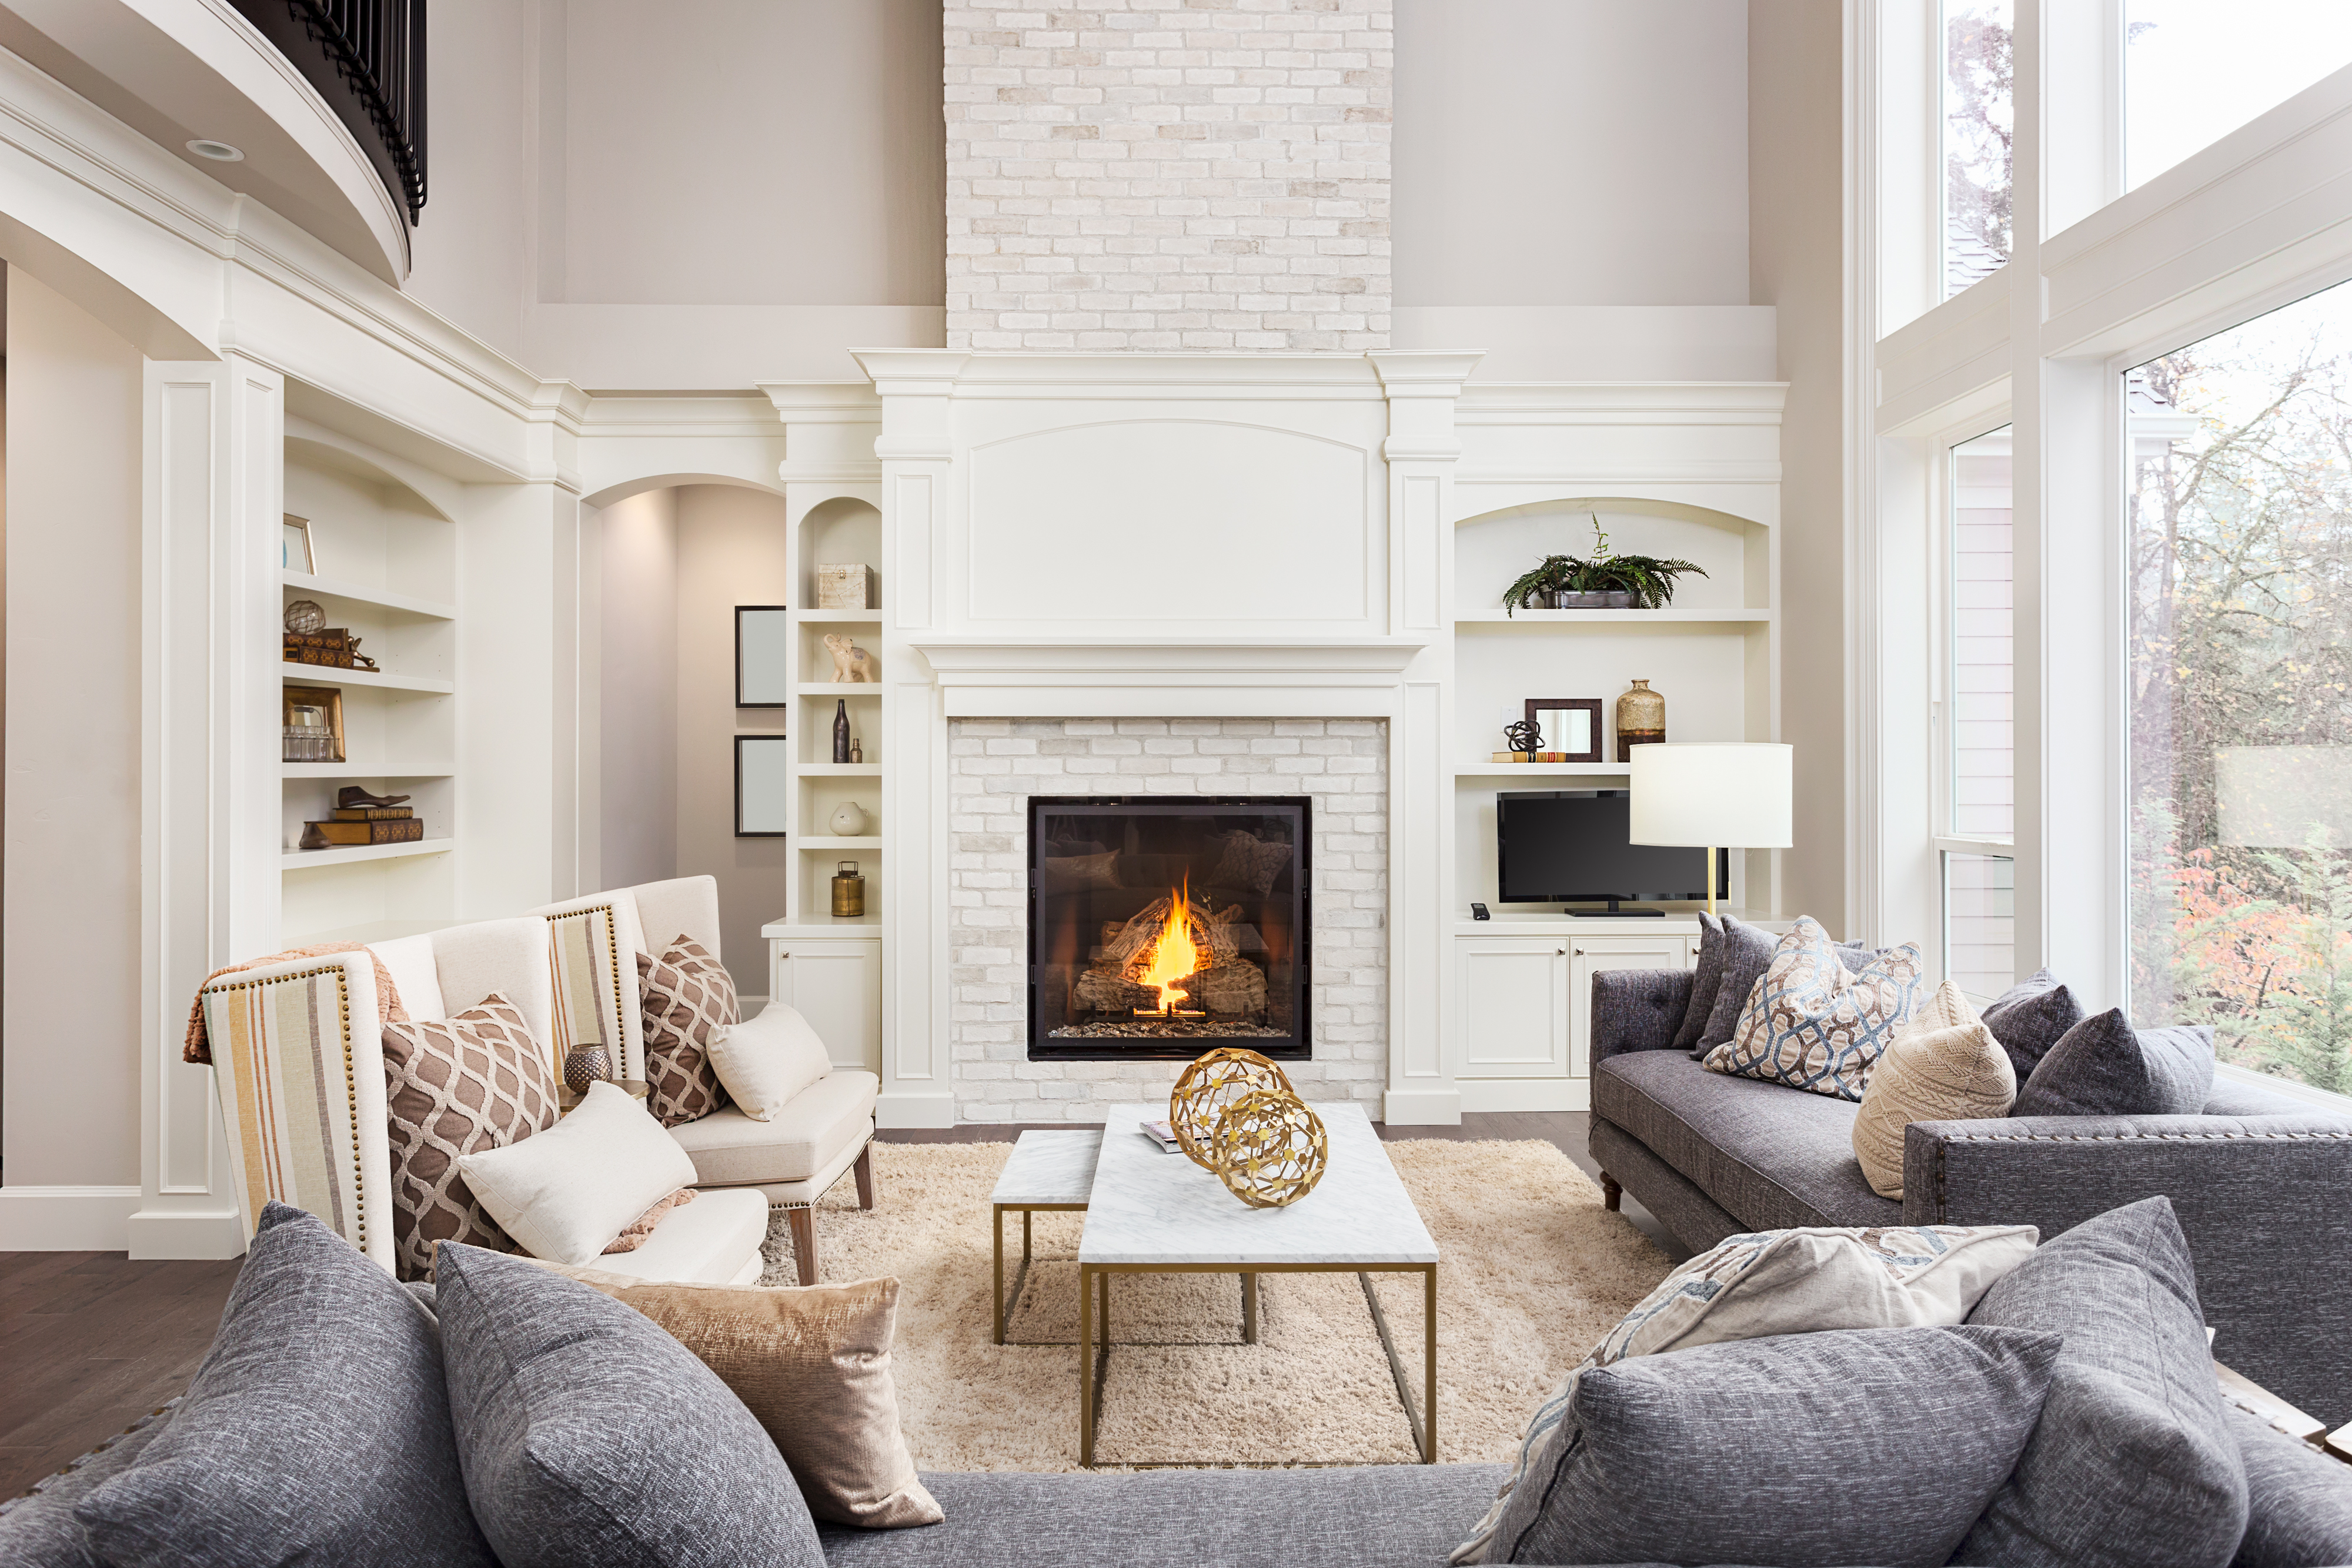 Interior Design: How Incorporating Elements Of Sensory Design Creates Beautiful Spaces